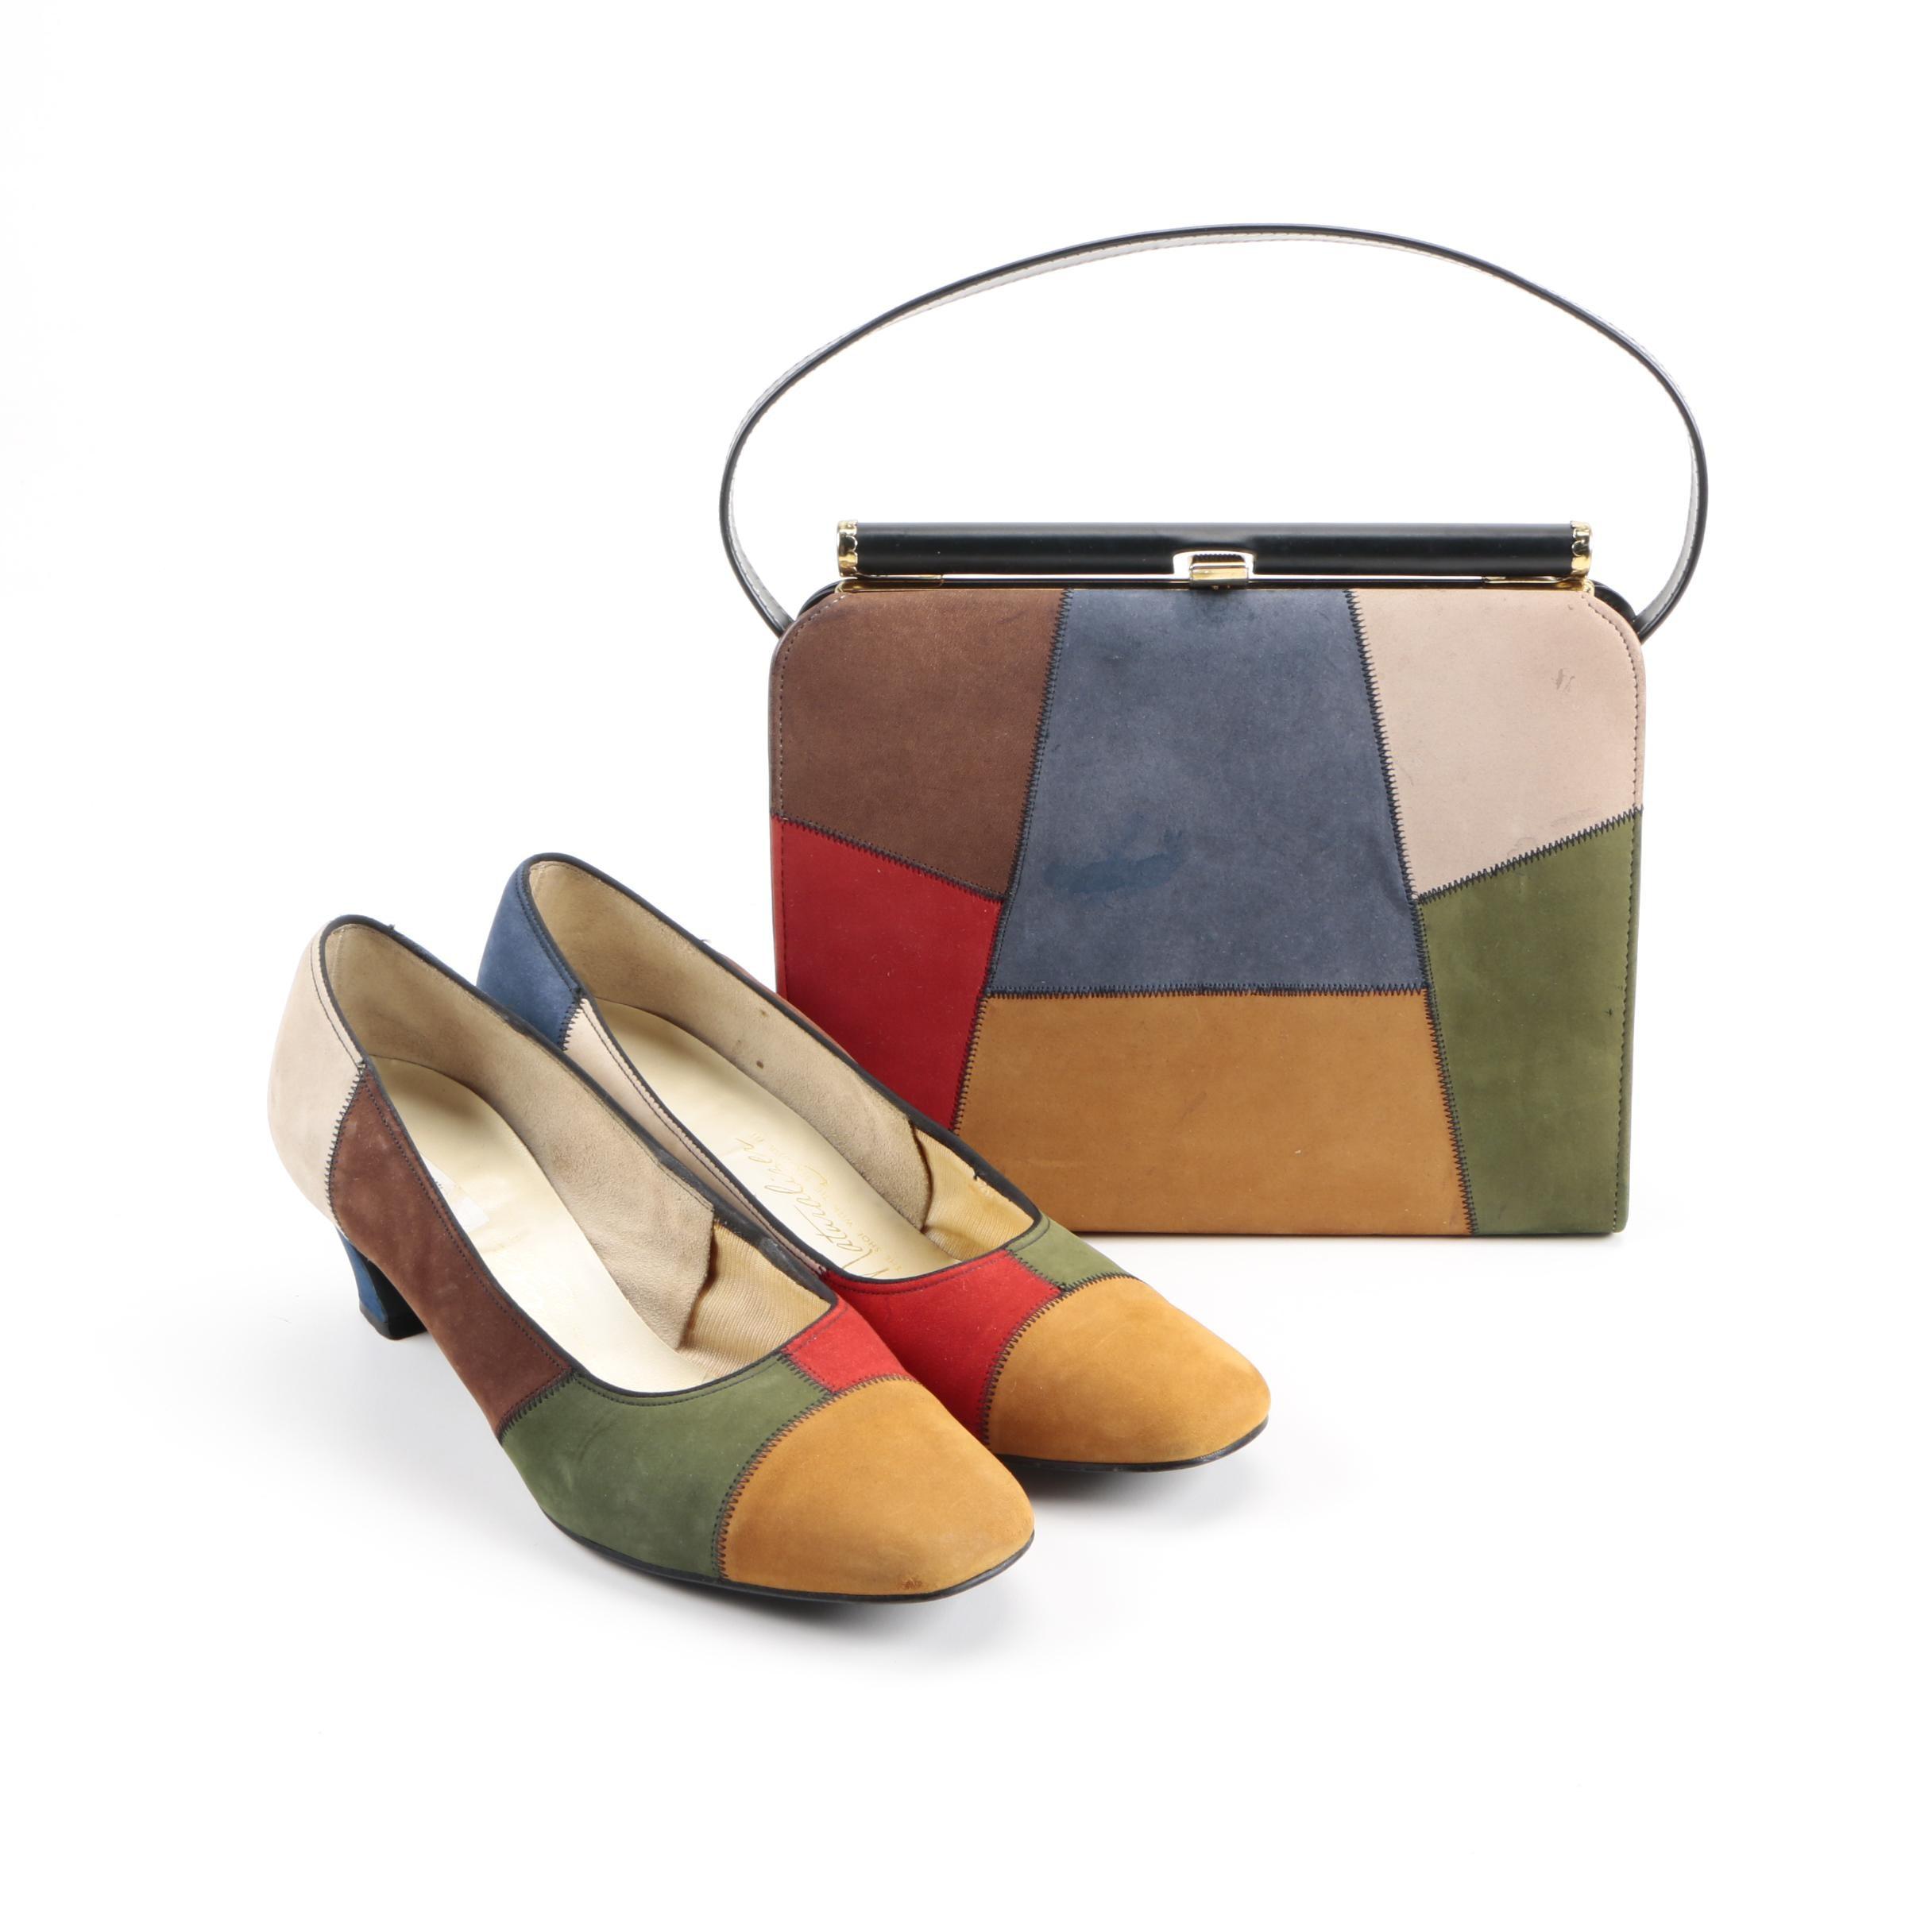 Vintage Naturalizer Matching Heels and Handbag Set